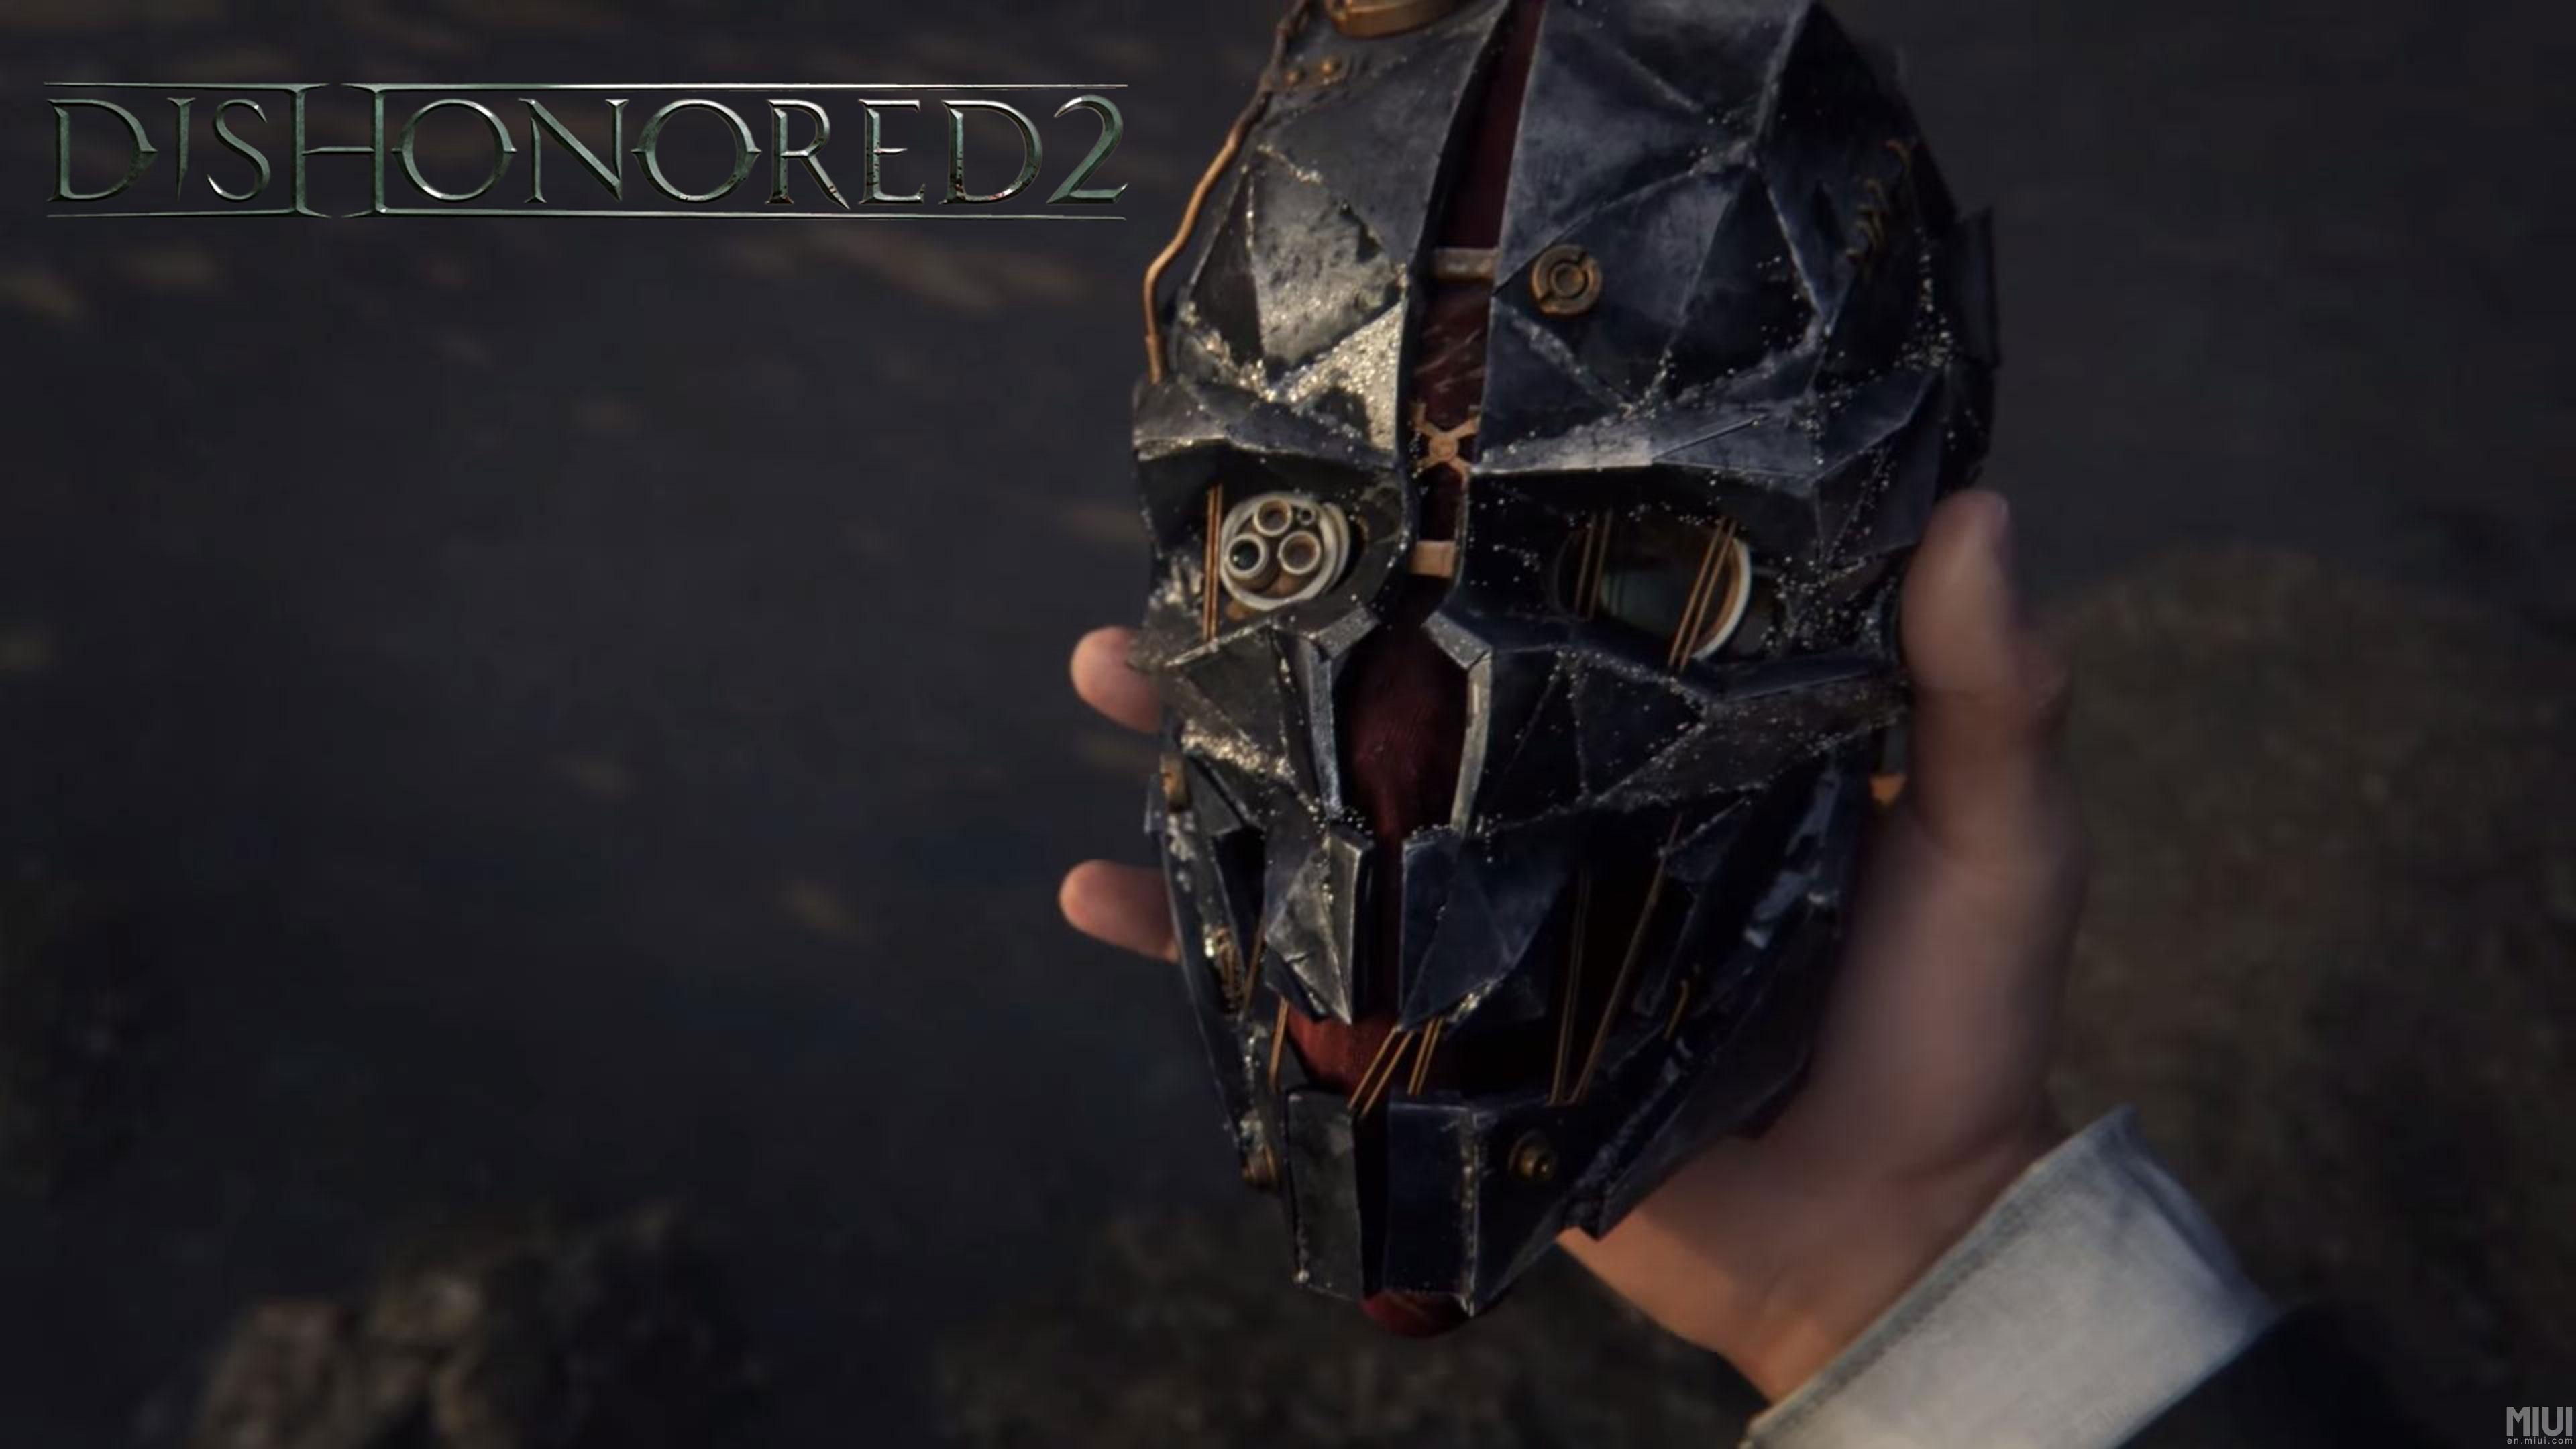 Gaming Dishonored 2 Corvo Mask 2213963 Hd Wallpaper